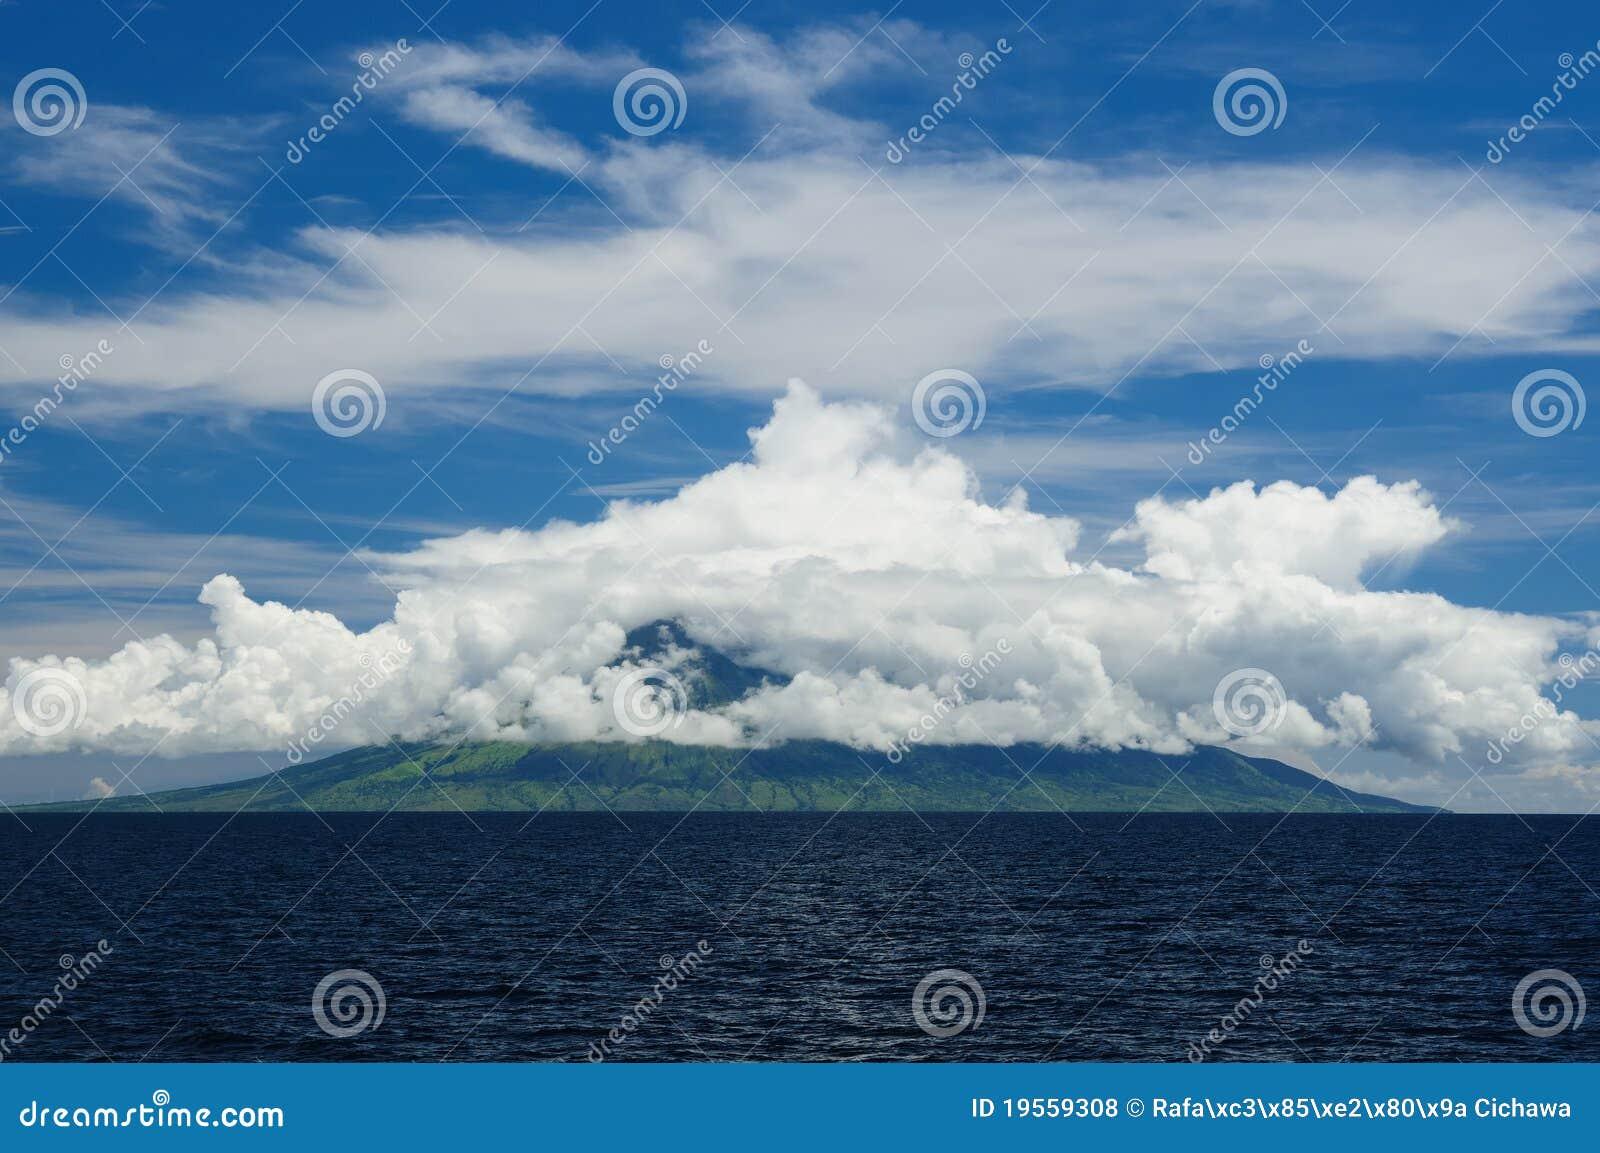 Indonesia, Flores sea, Gunung Api